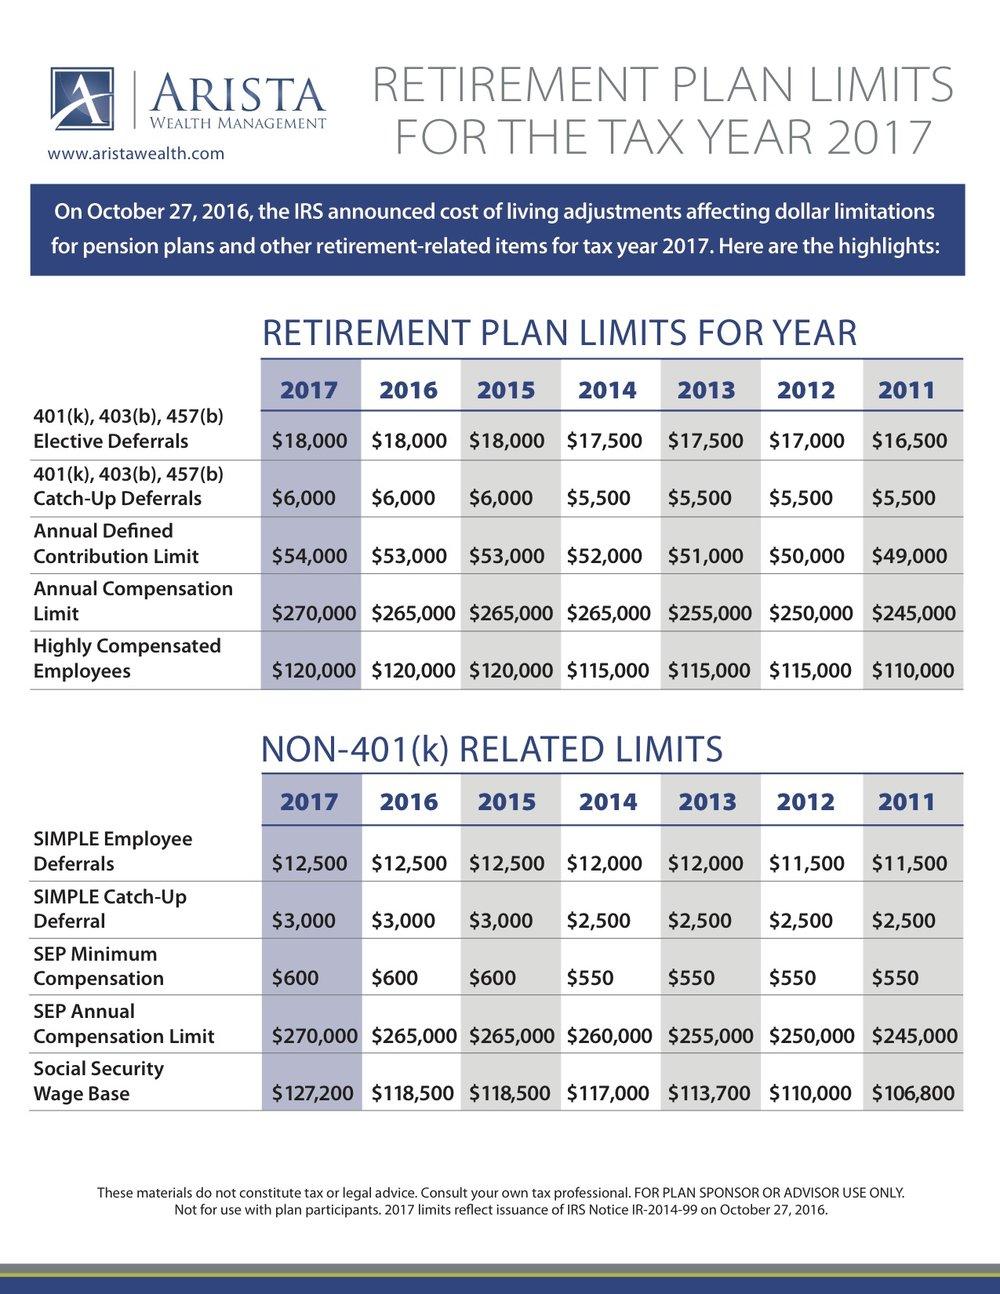 401(k) & Retirement Plan Limits for 2017